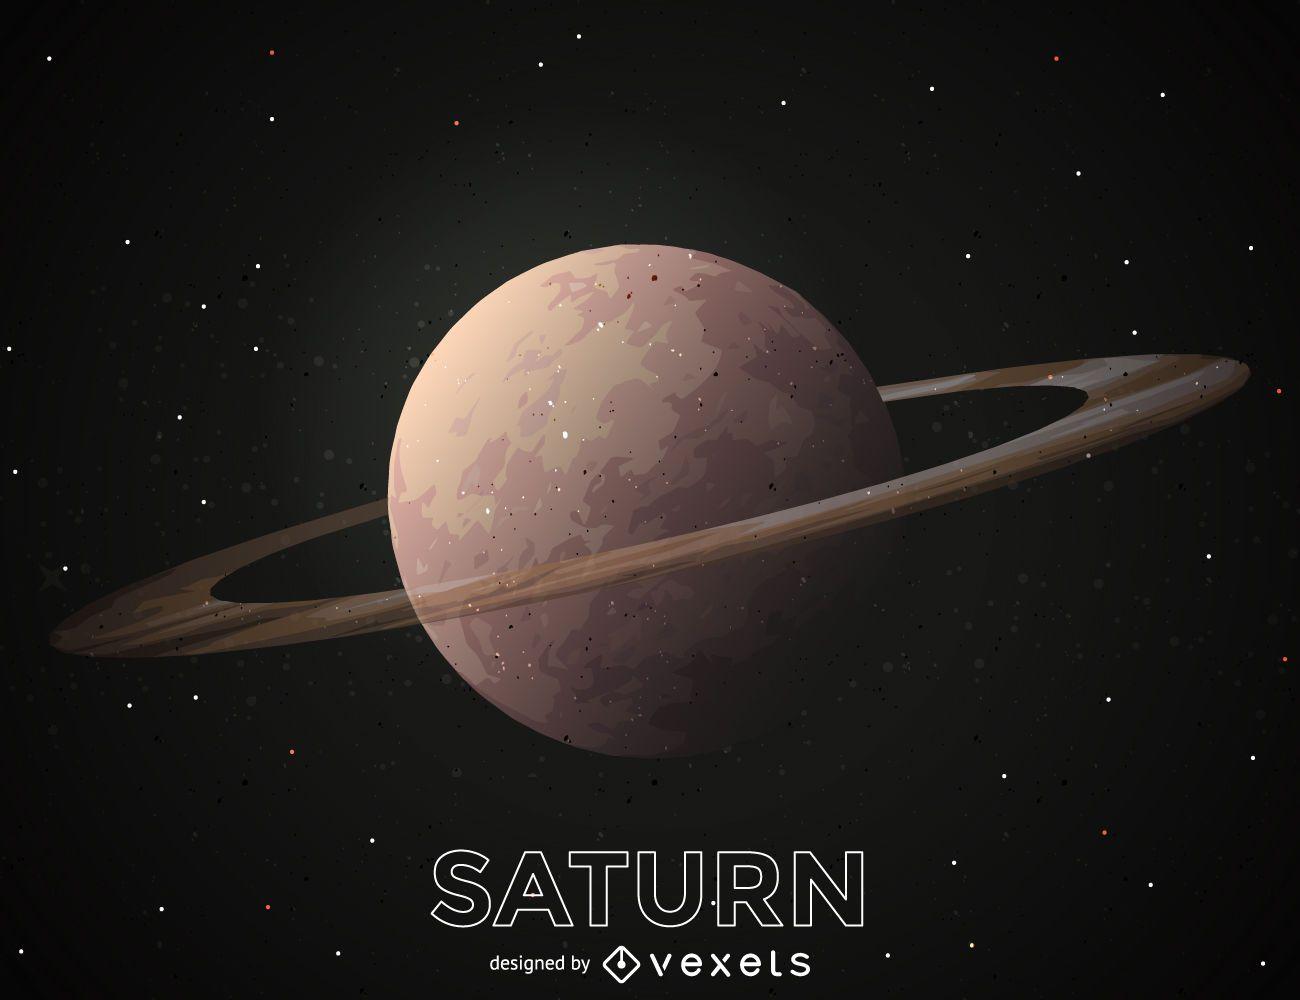 Saturn planet illustration